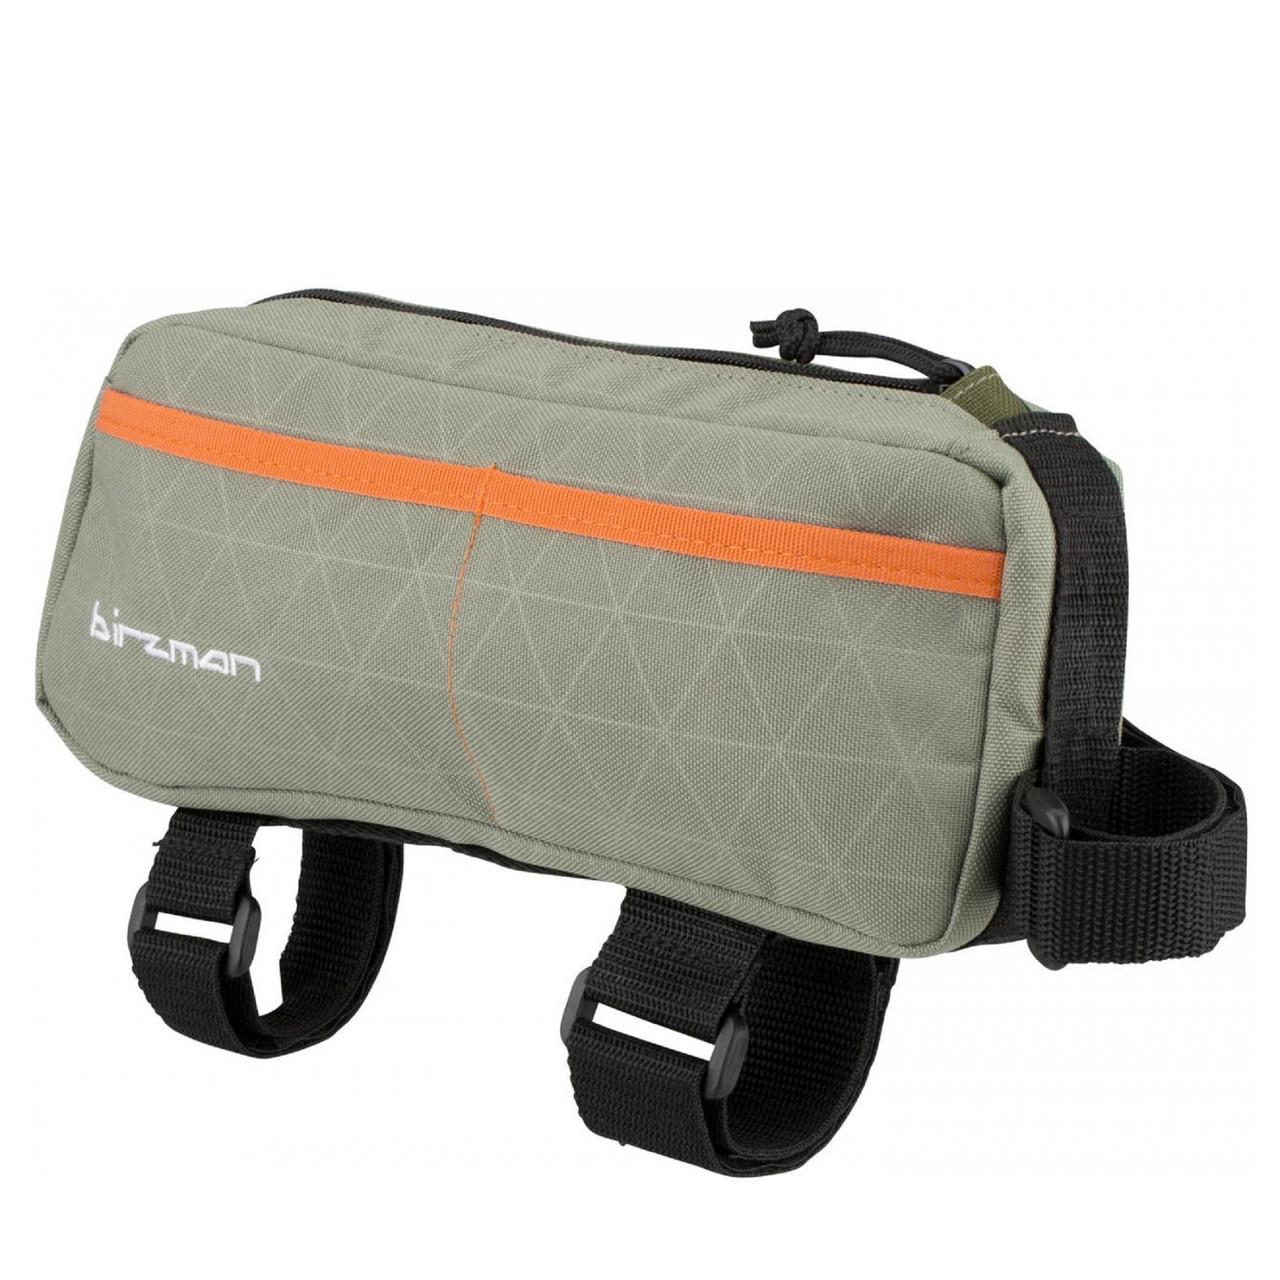 Сумка Birzman Packman Travel Top Tube Pack, 0.8 л